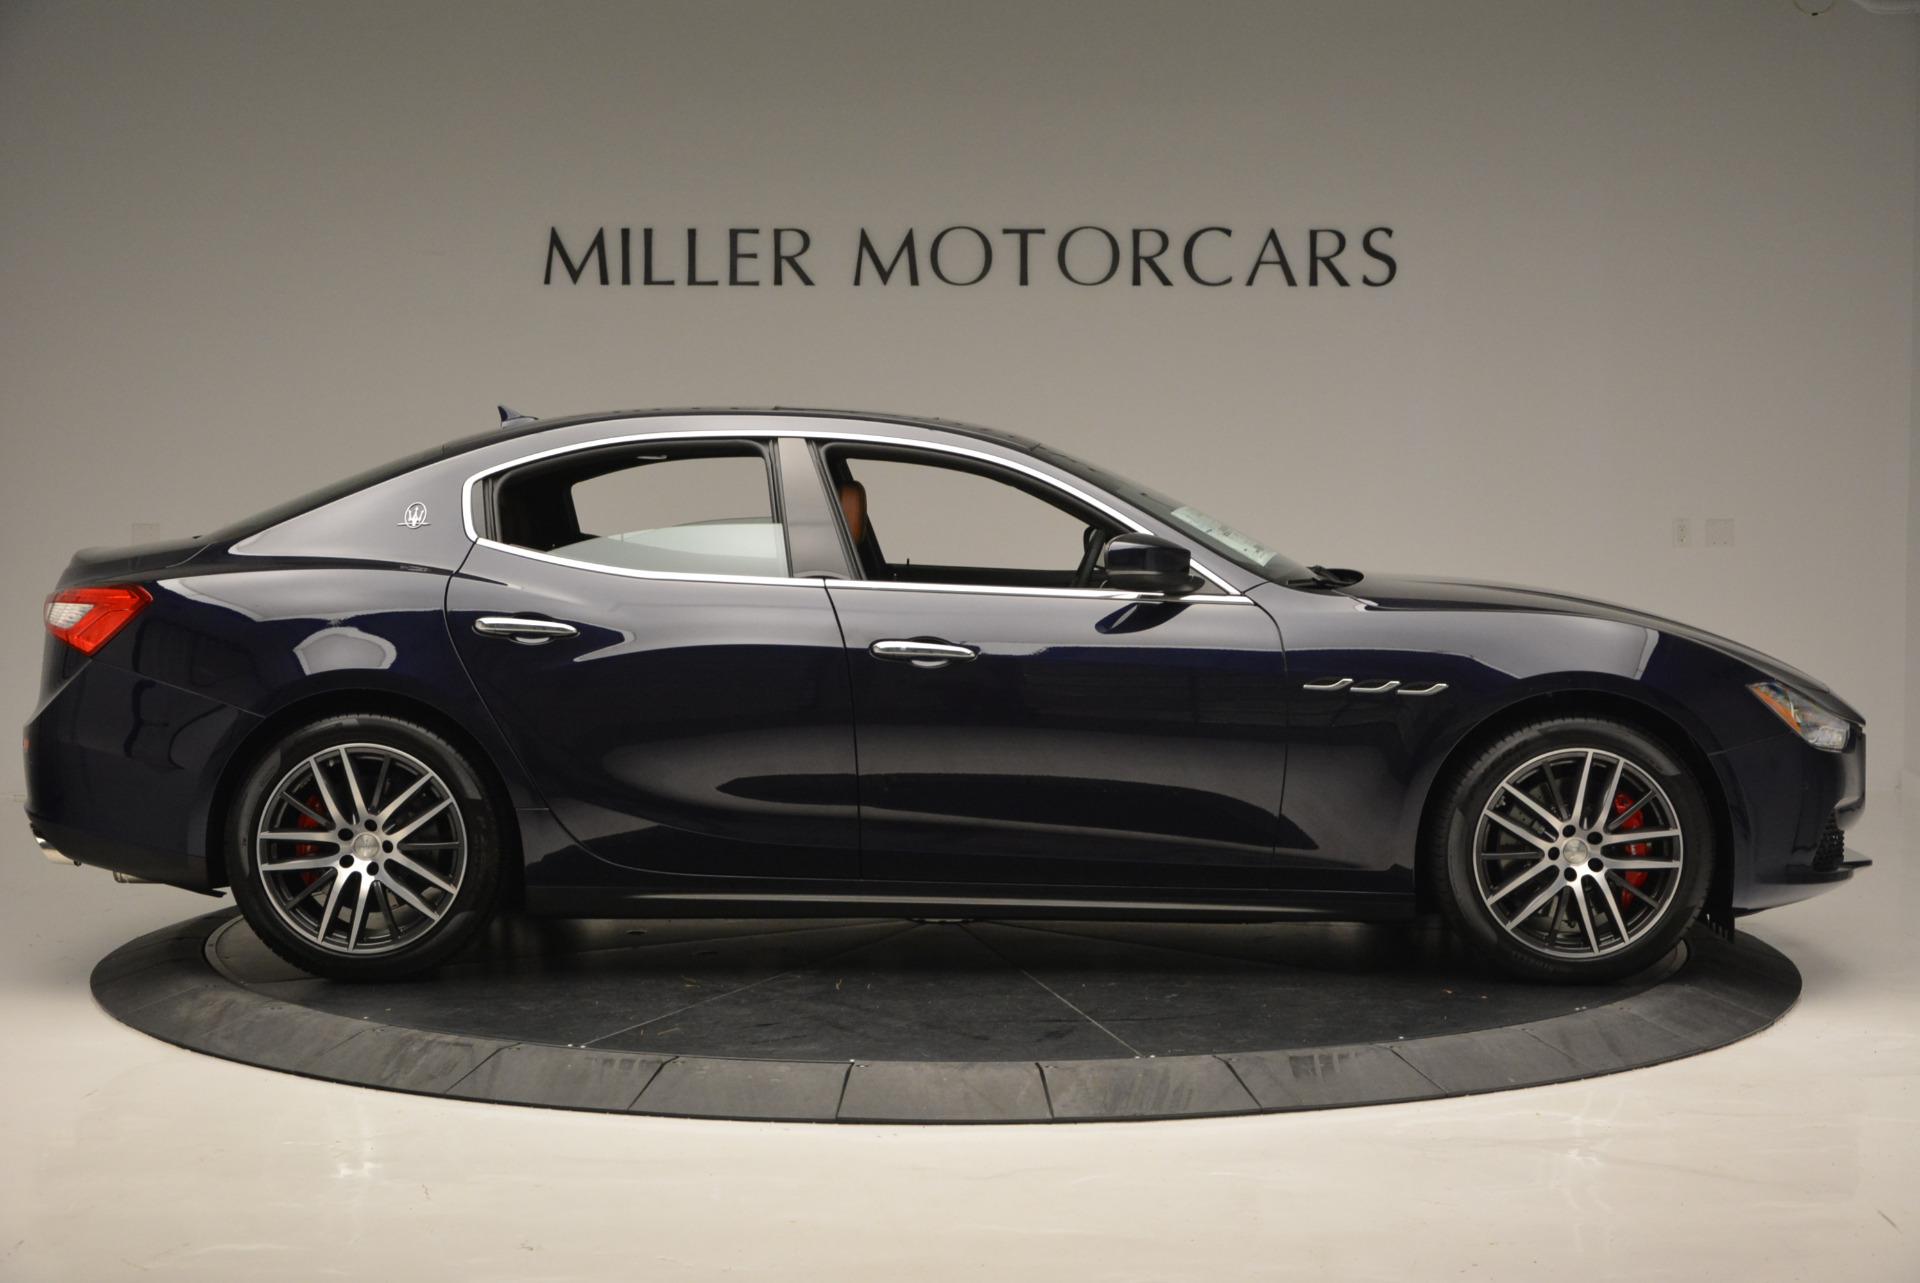 Used 2017 Maserati Ghibli S Q4 - EX Loaner For Sale In Greenwich, CT. Alfa Romeo of Greenwich, M1662 568_p9